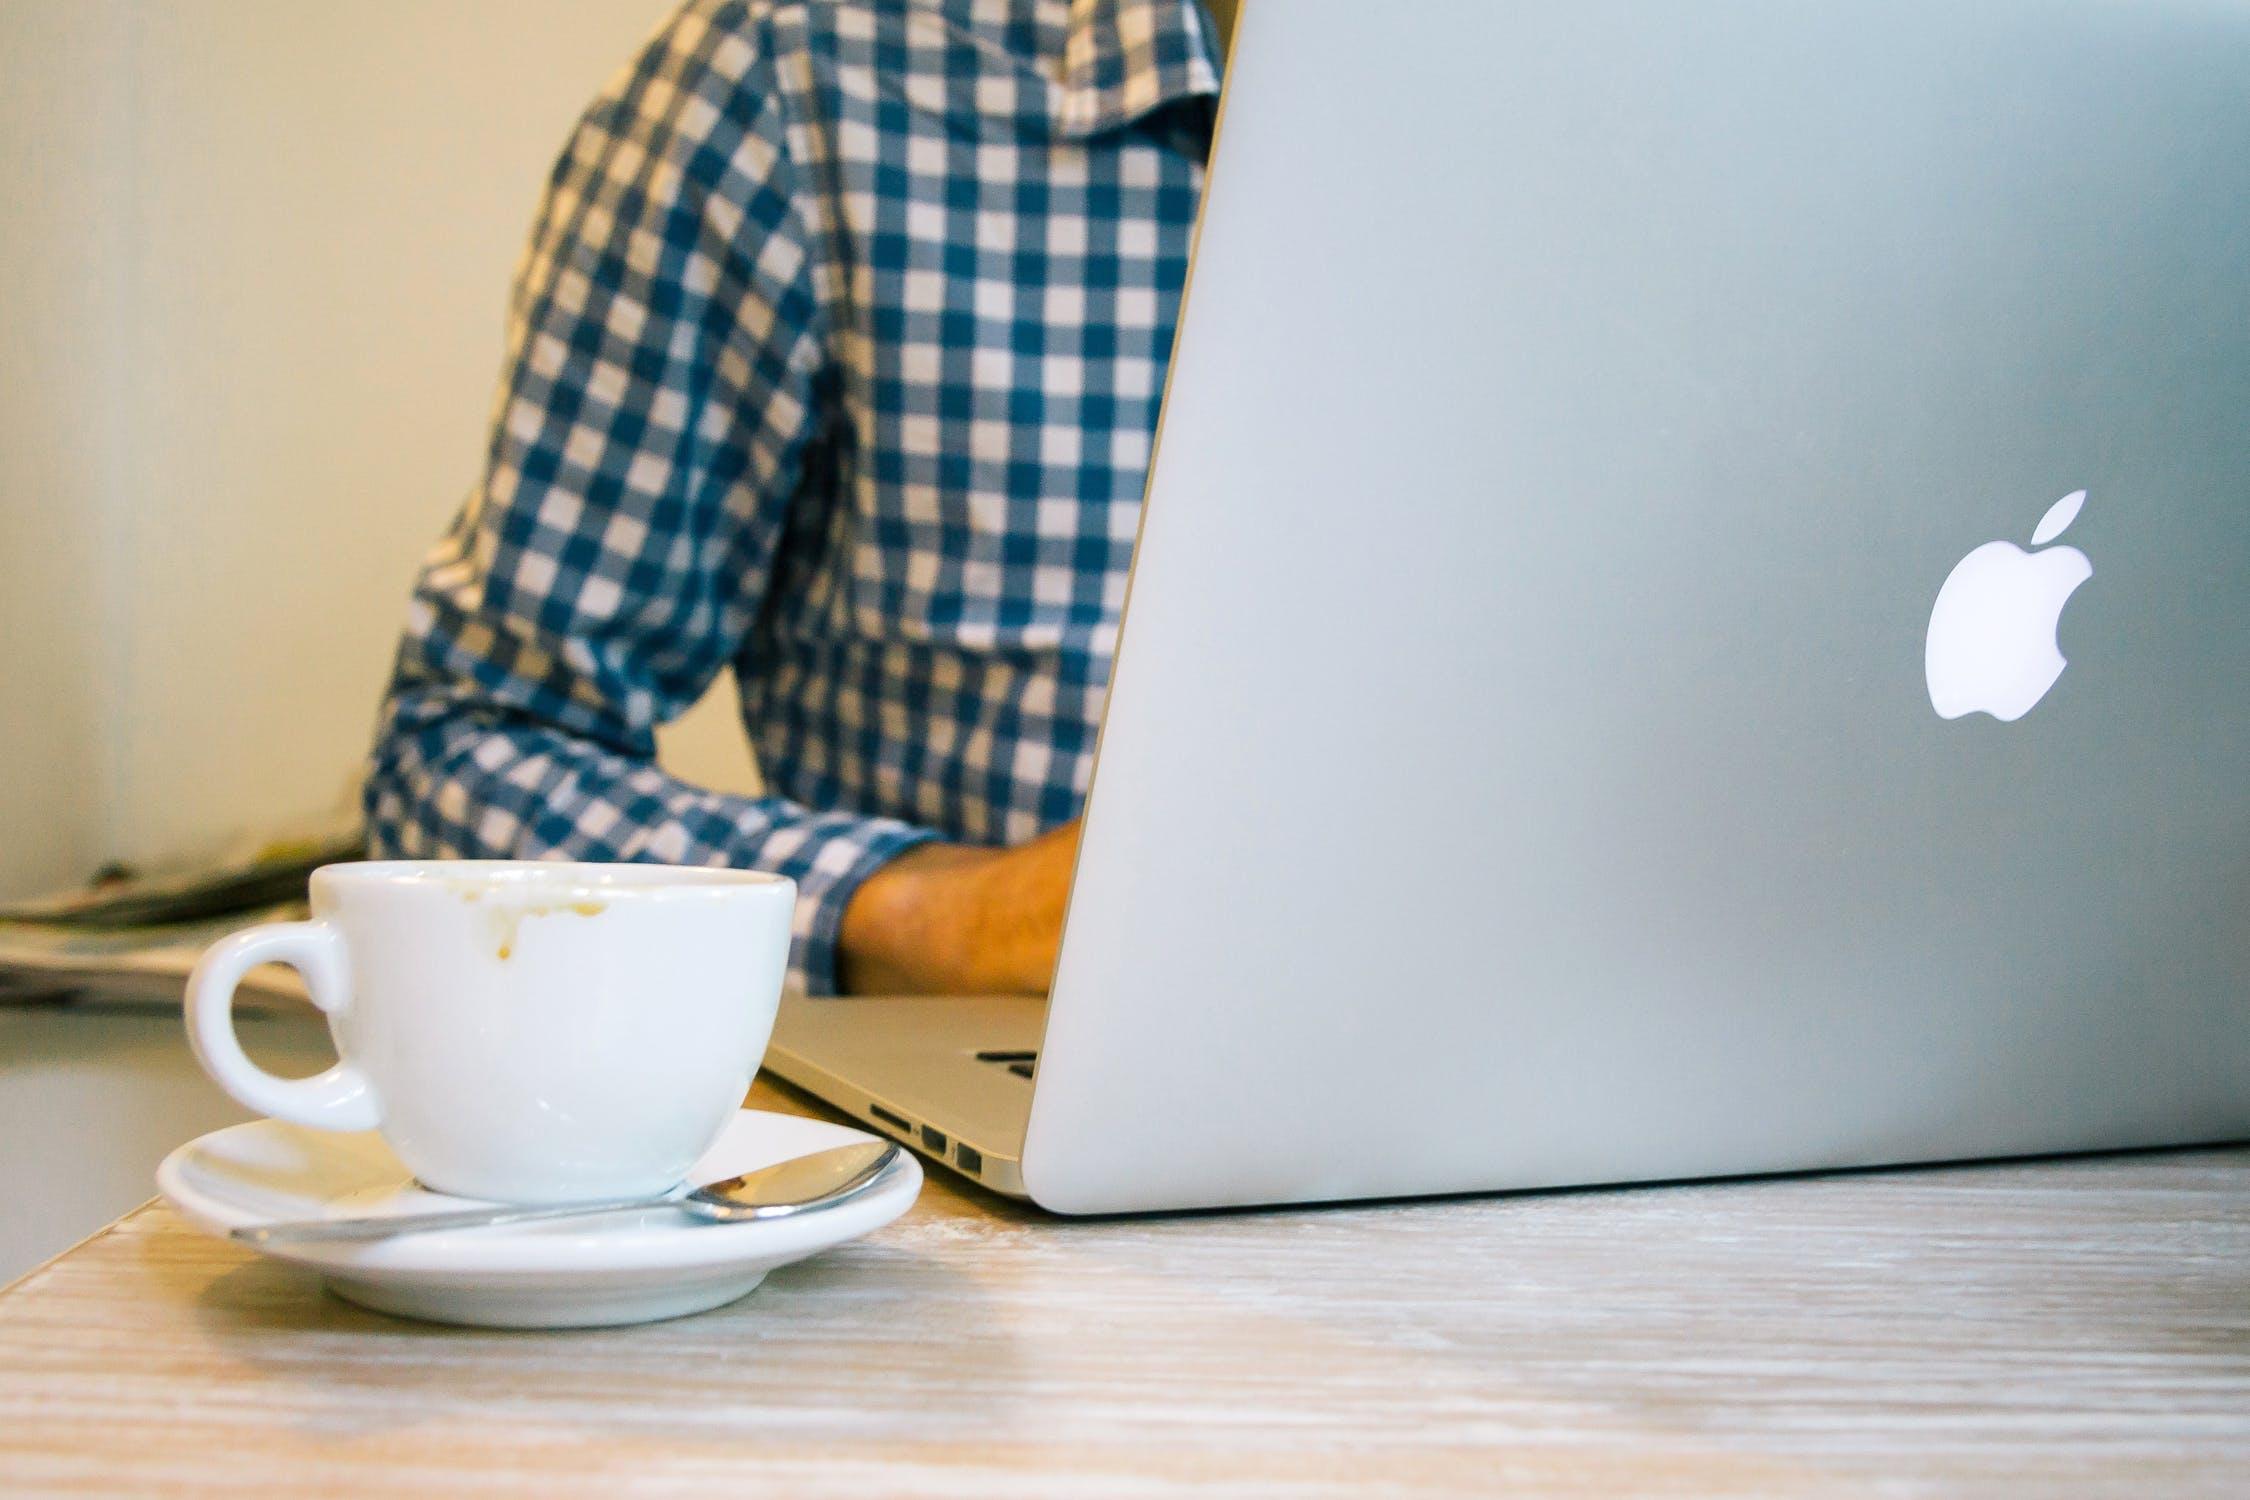 Usługi komunalne online